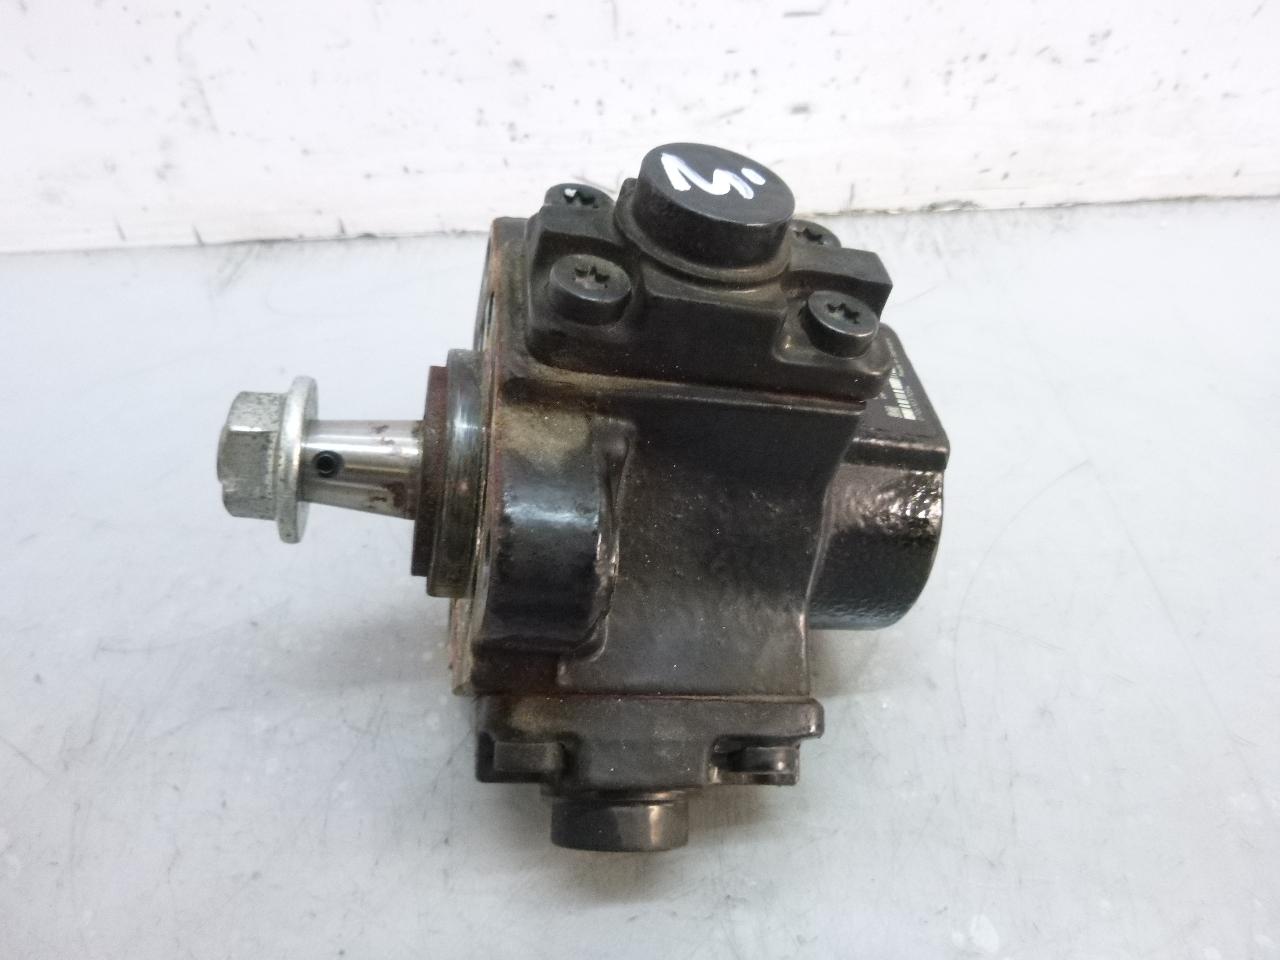 Hochdruckpumpe Opel Astra Cascada 9-5 2,0 CDTI A20DTH 0445010193 DE291337